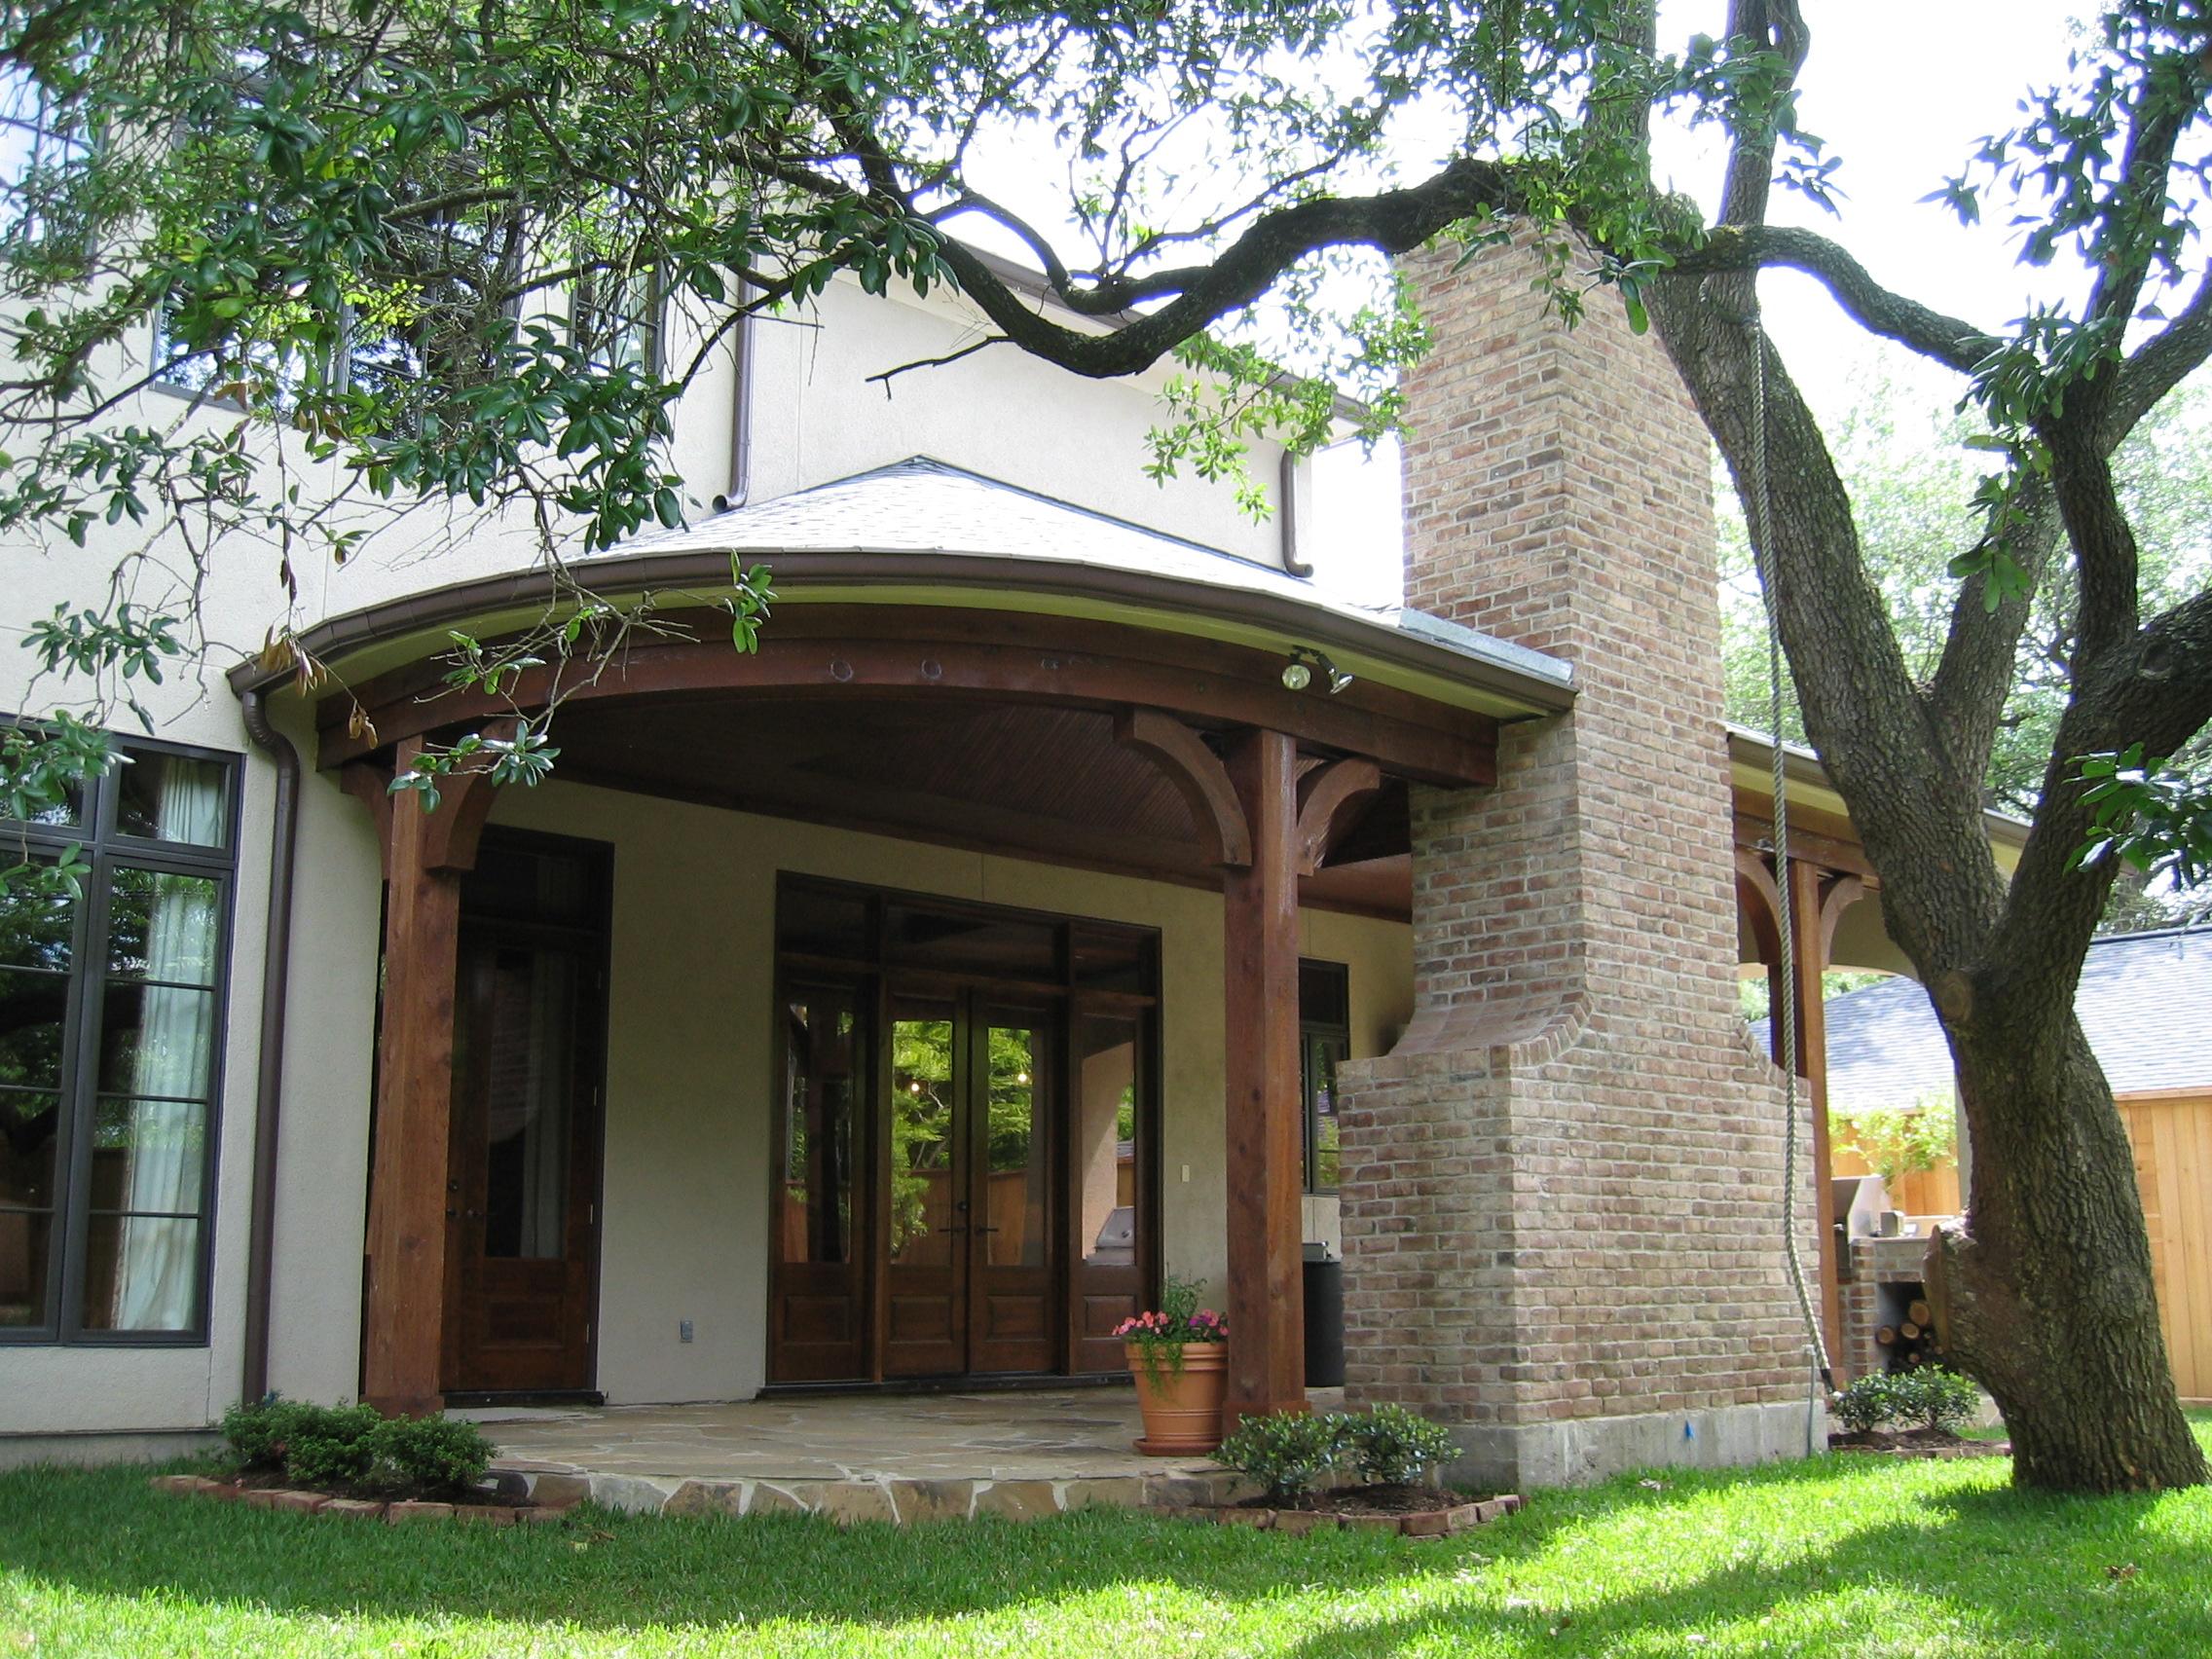 Award Winning Bellaire Showcase 2005, rear porch, cedar beams, outdoor kitchen by Watermark Builders in Houston Texas